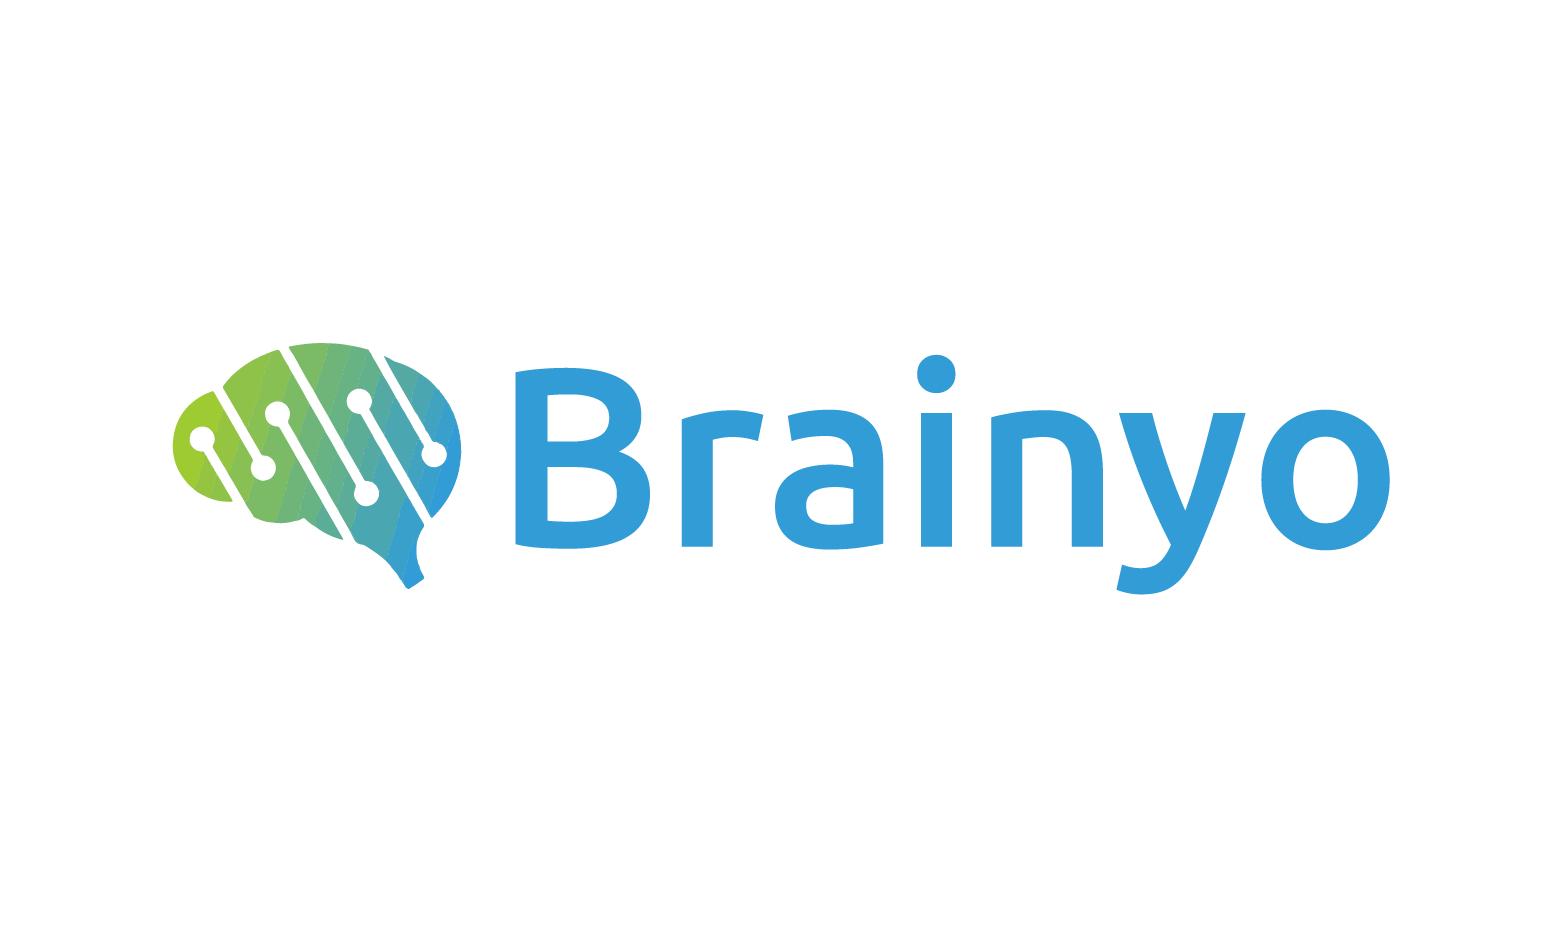 Brainyo.com